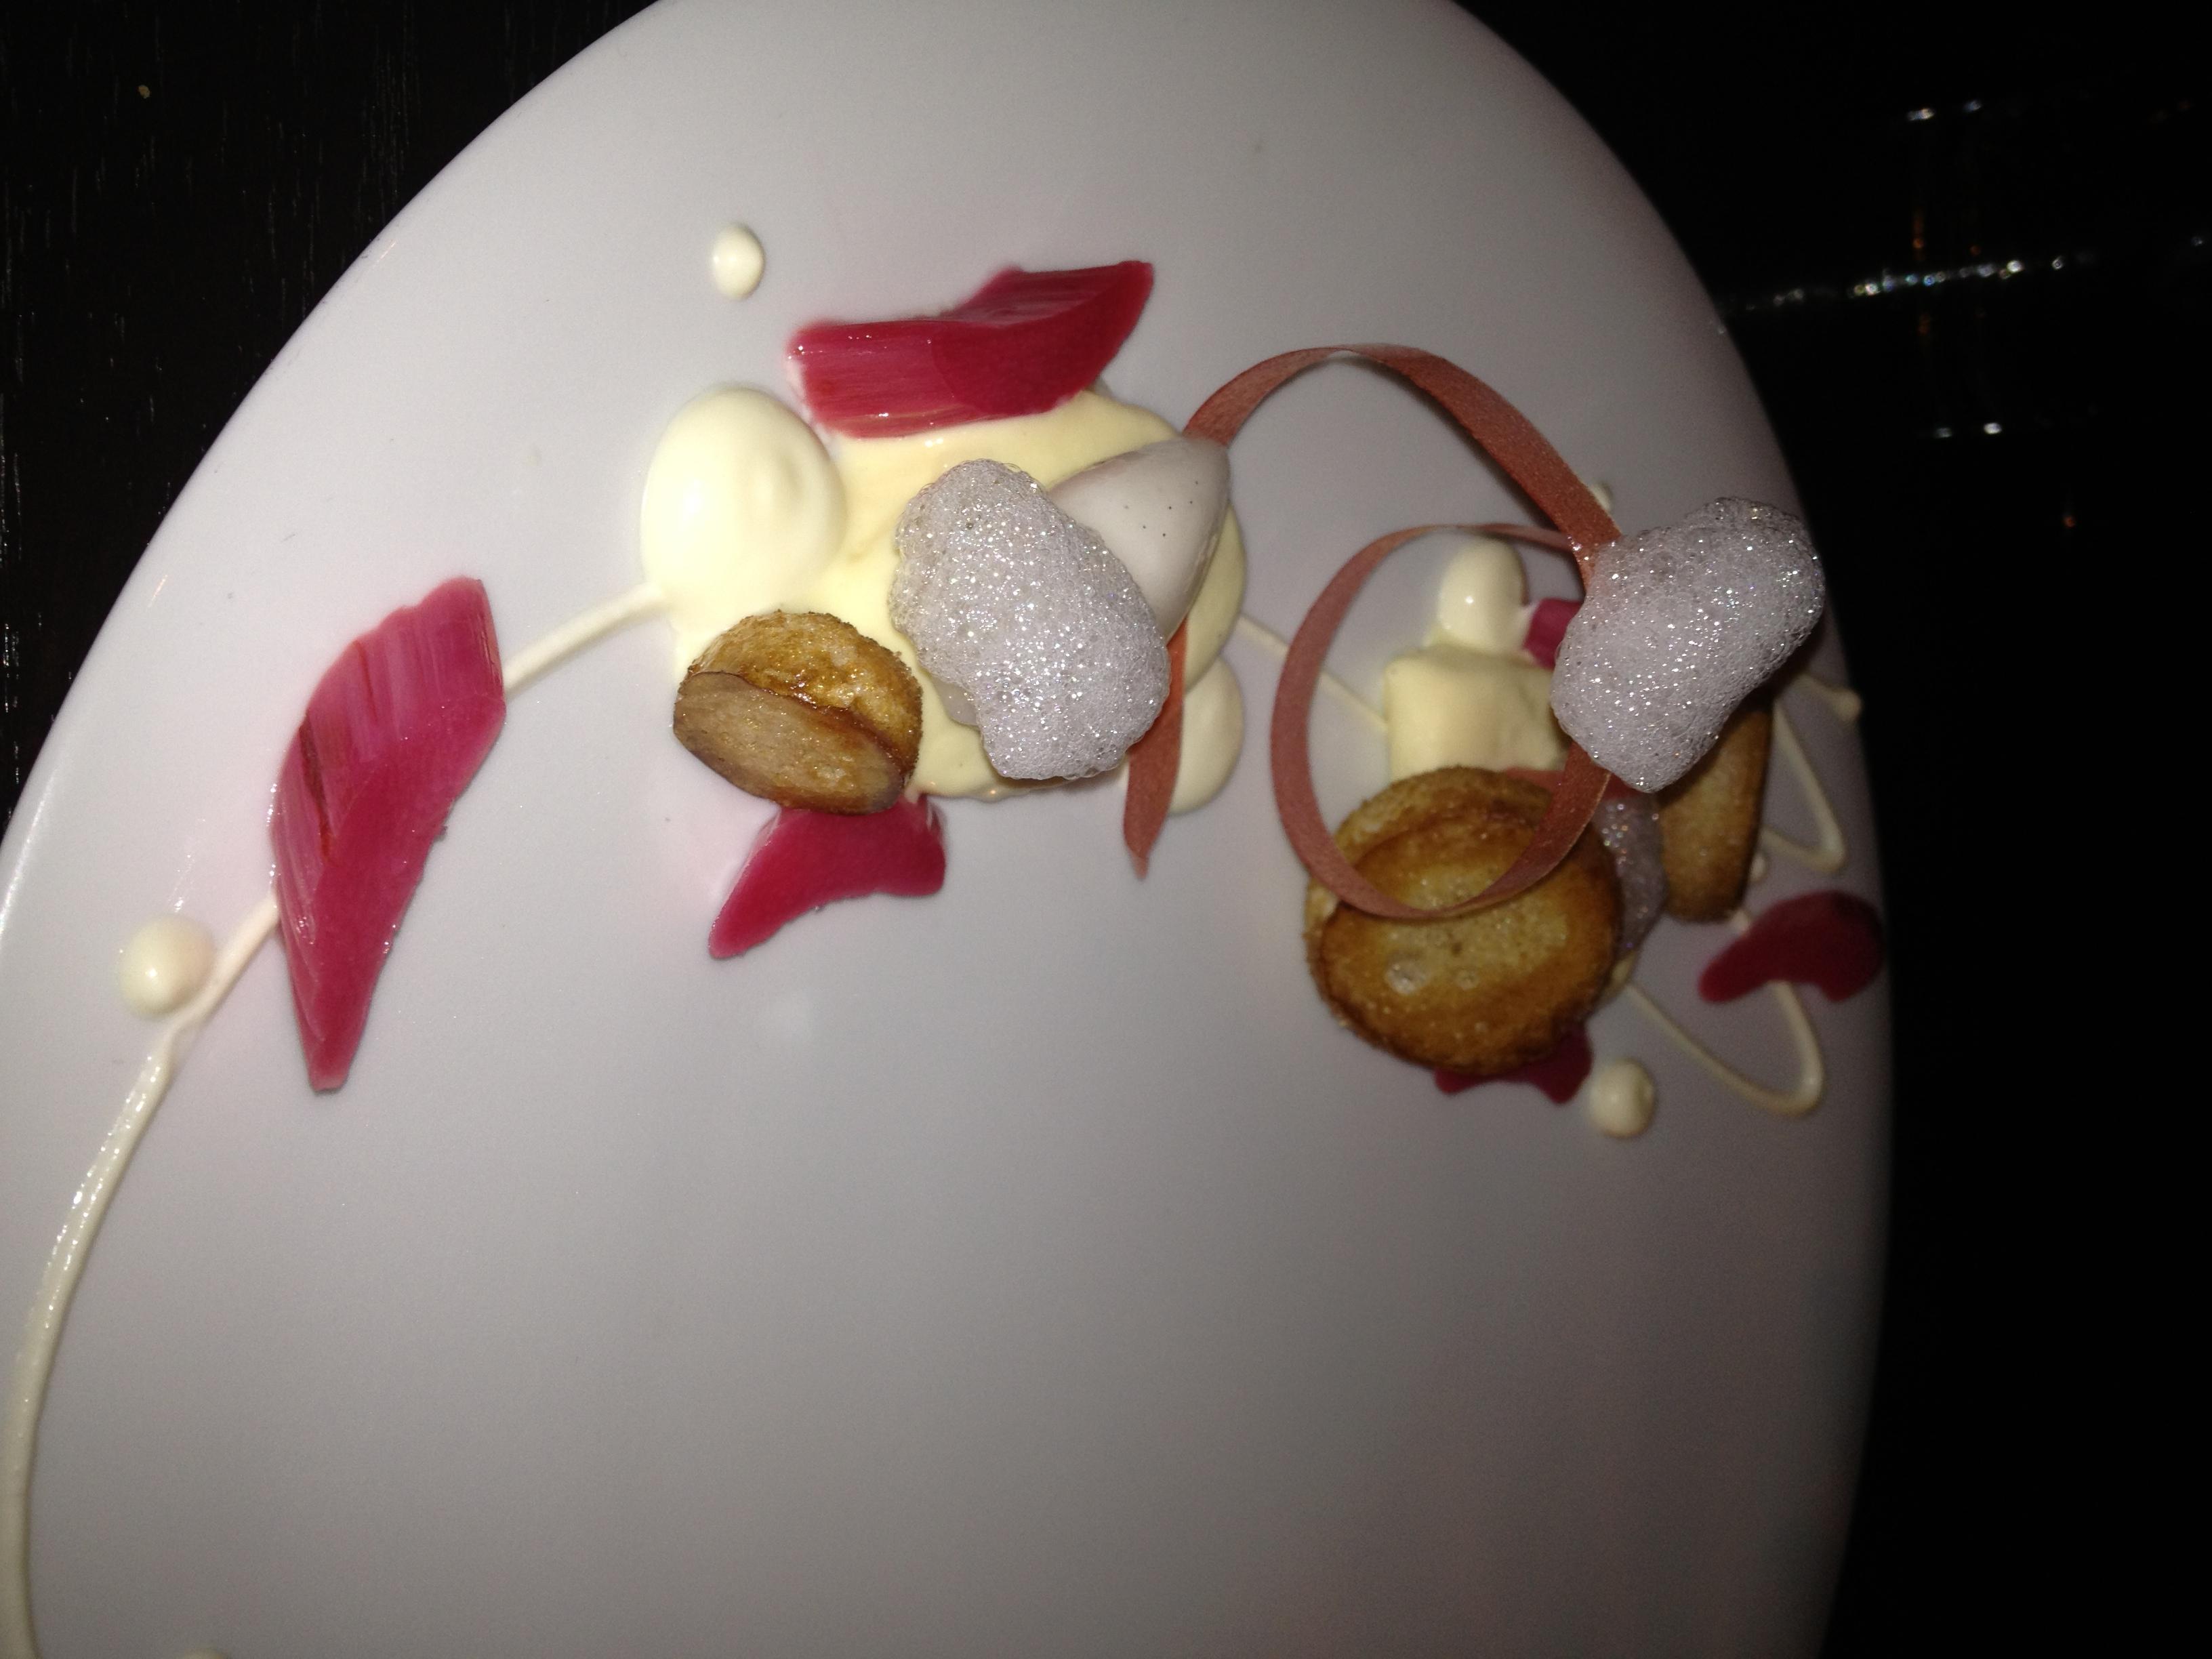 empellon cocina vanilla ice cream with rhubarb.JPG